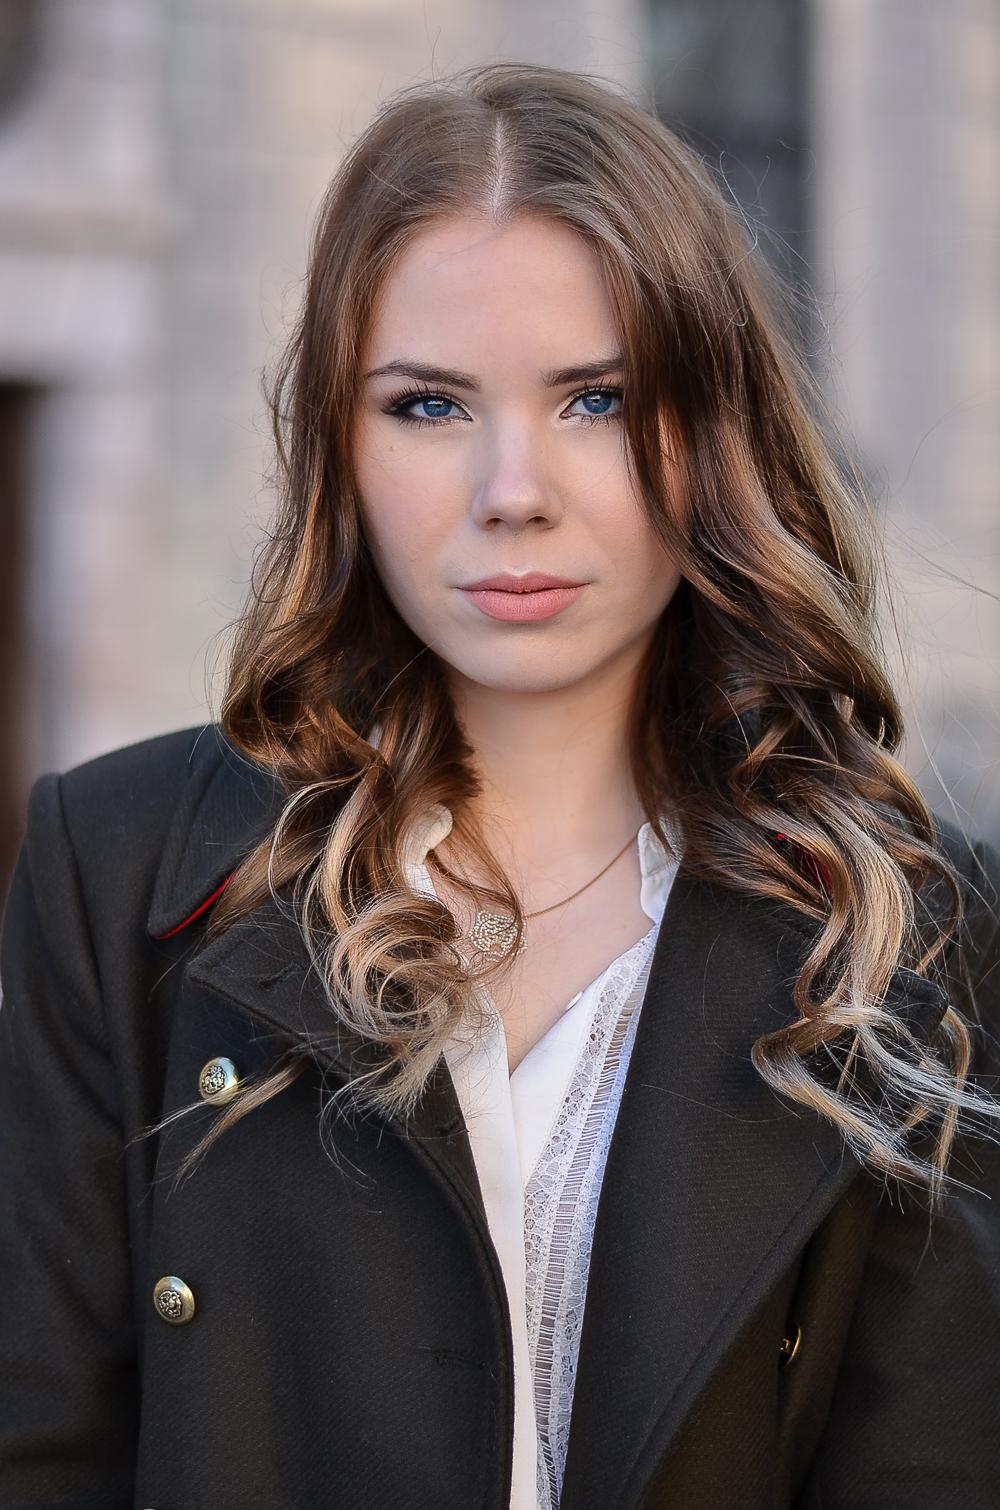 Detailbild-Portrait-Fashionblogger-Locken-Military Jacke-khaki-Zara